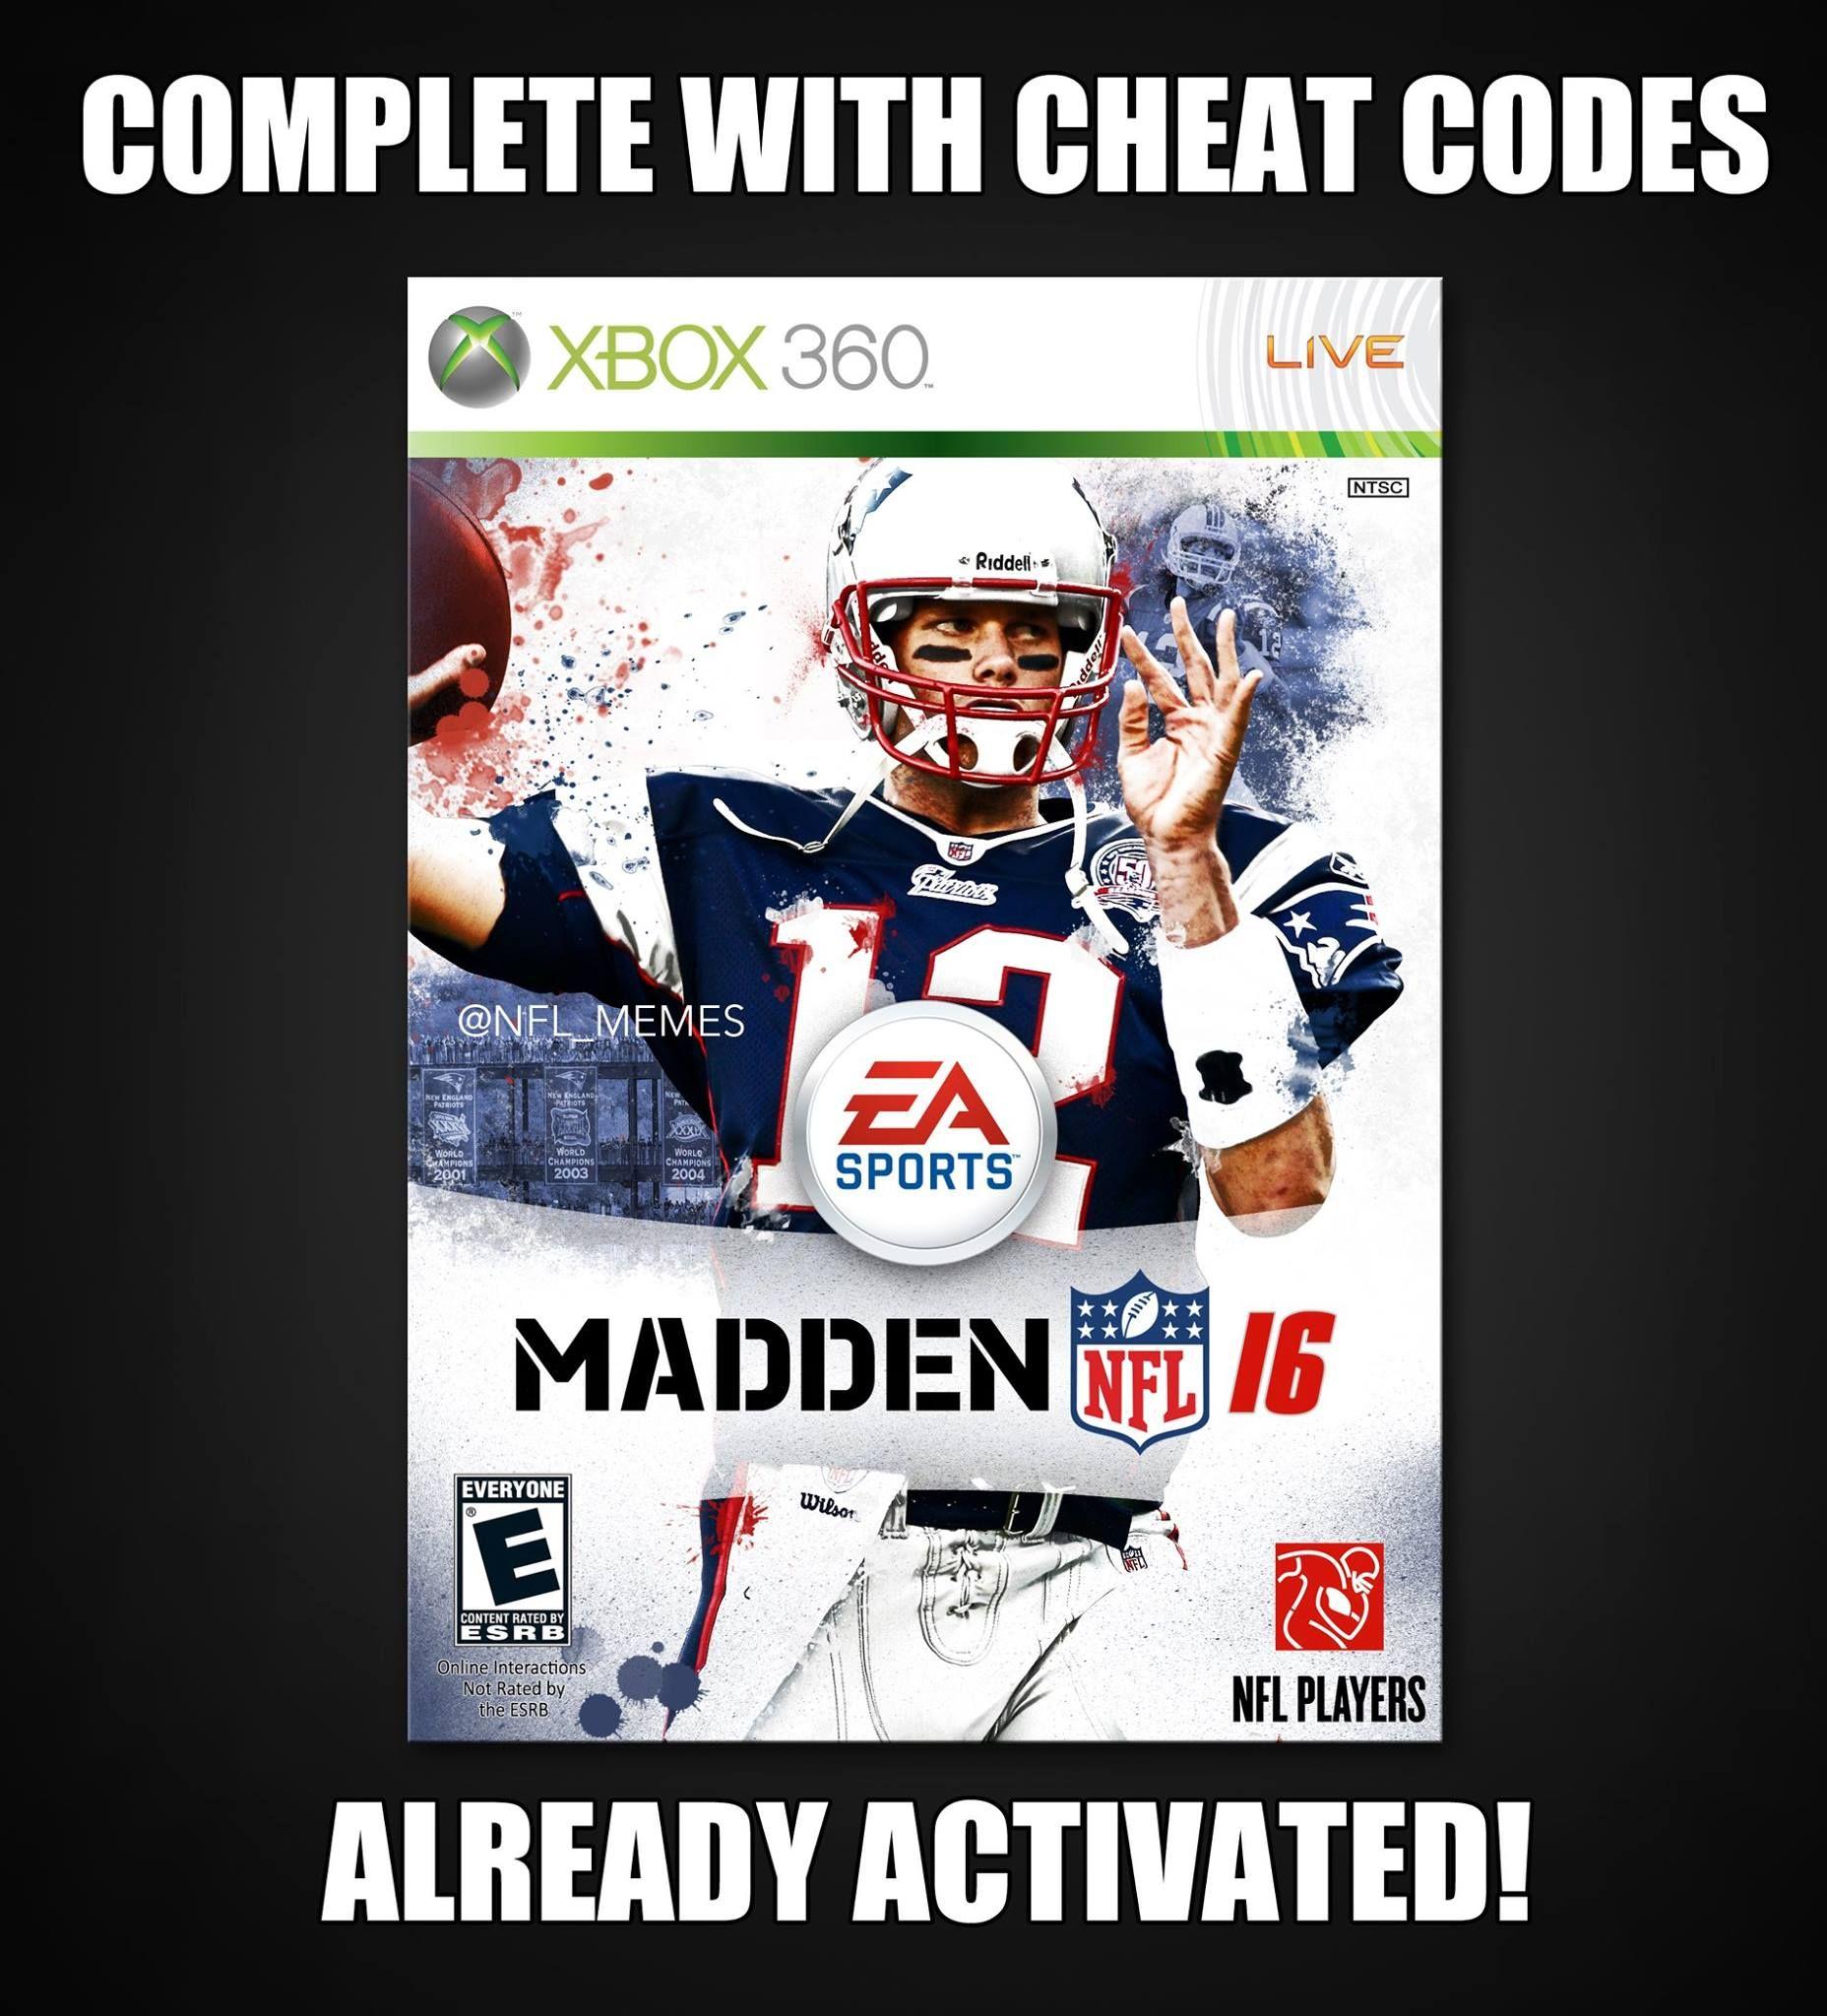 Super Bowl Ready The Best Nfl Memes Ever Nfl Memes Funny Nfl Memes Fantasy Football Funny